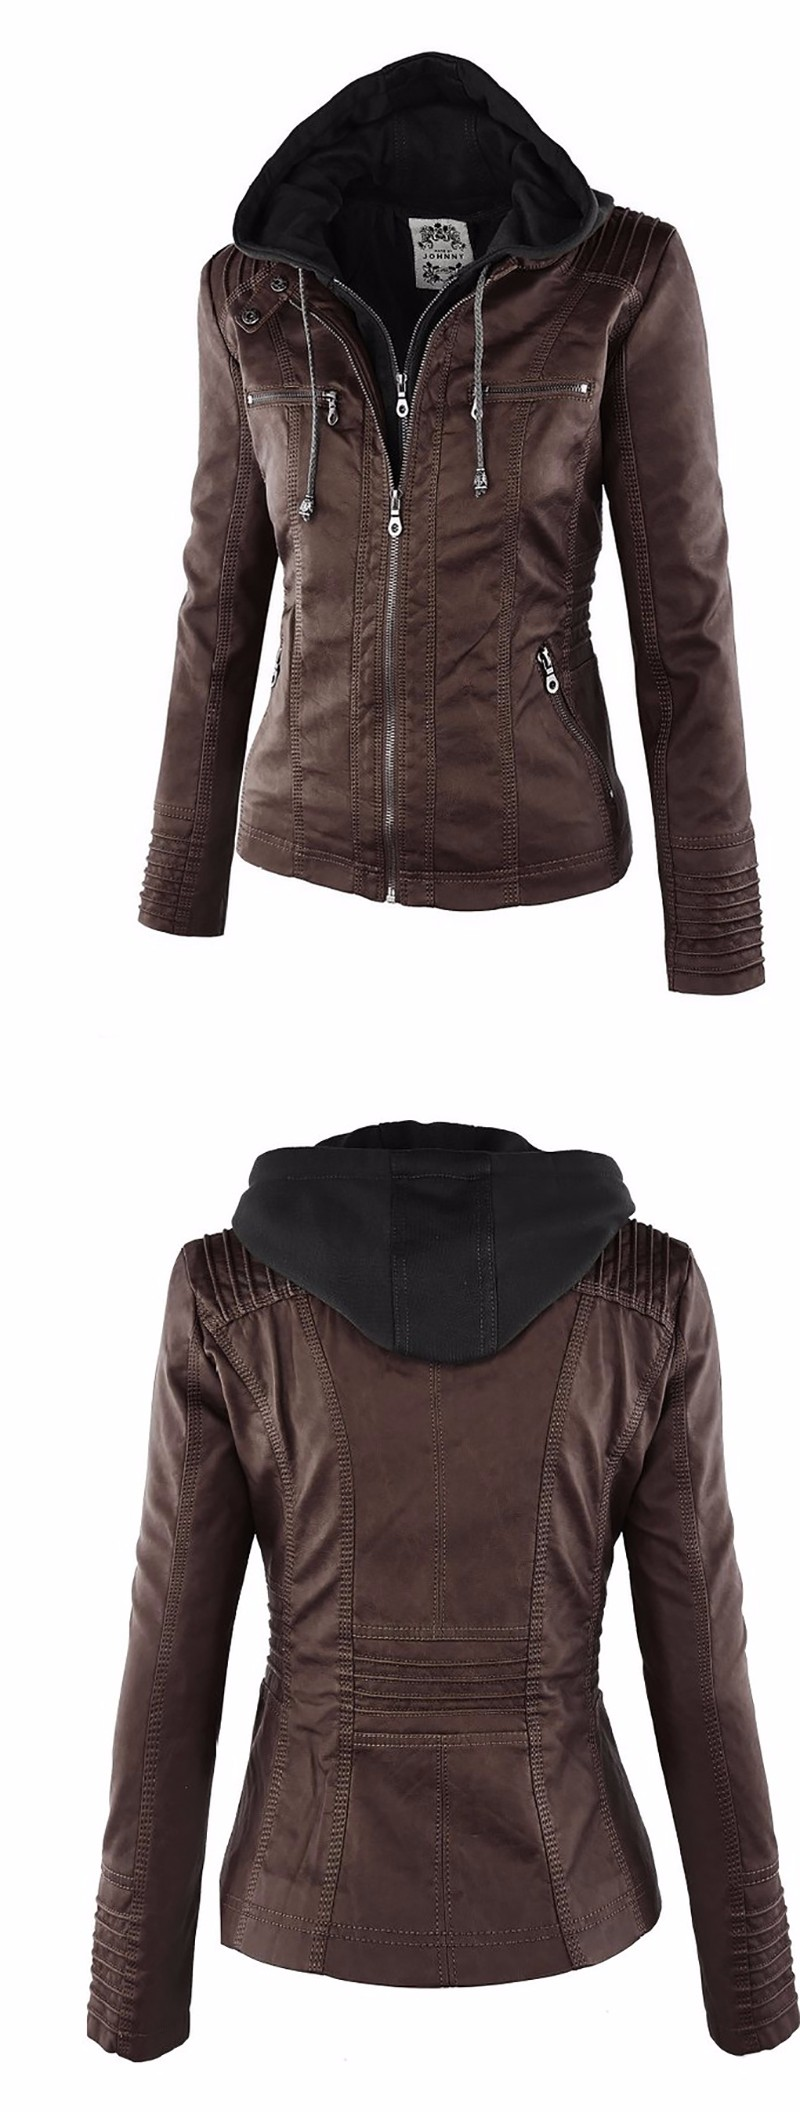 18 Winter Faux Leather Jacket Women Casual Basic Coats Plus Size 7XL Ladies Basic Jackets Waterproof Windproof Coats Female 50 10